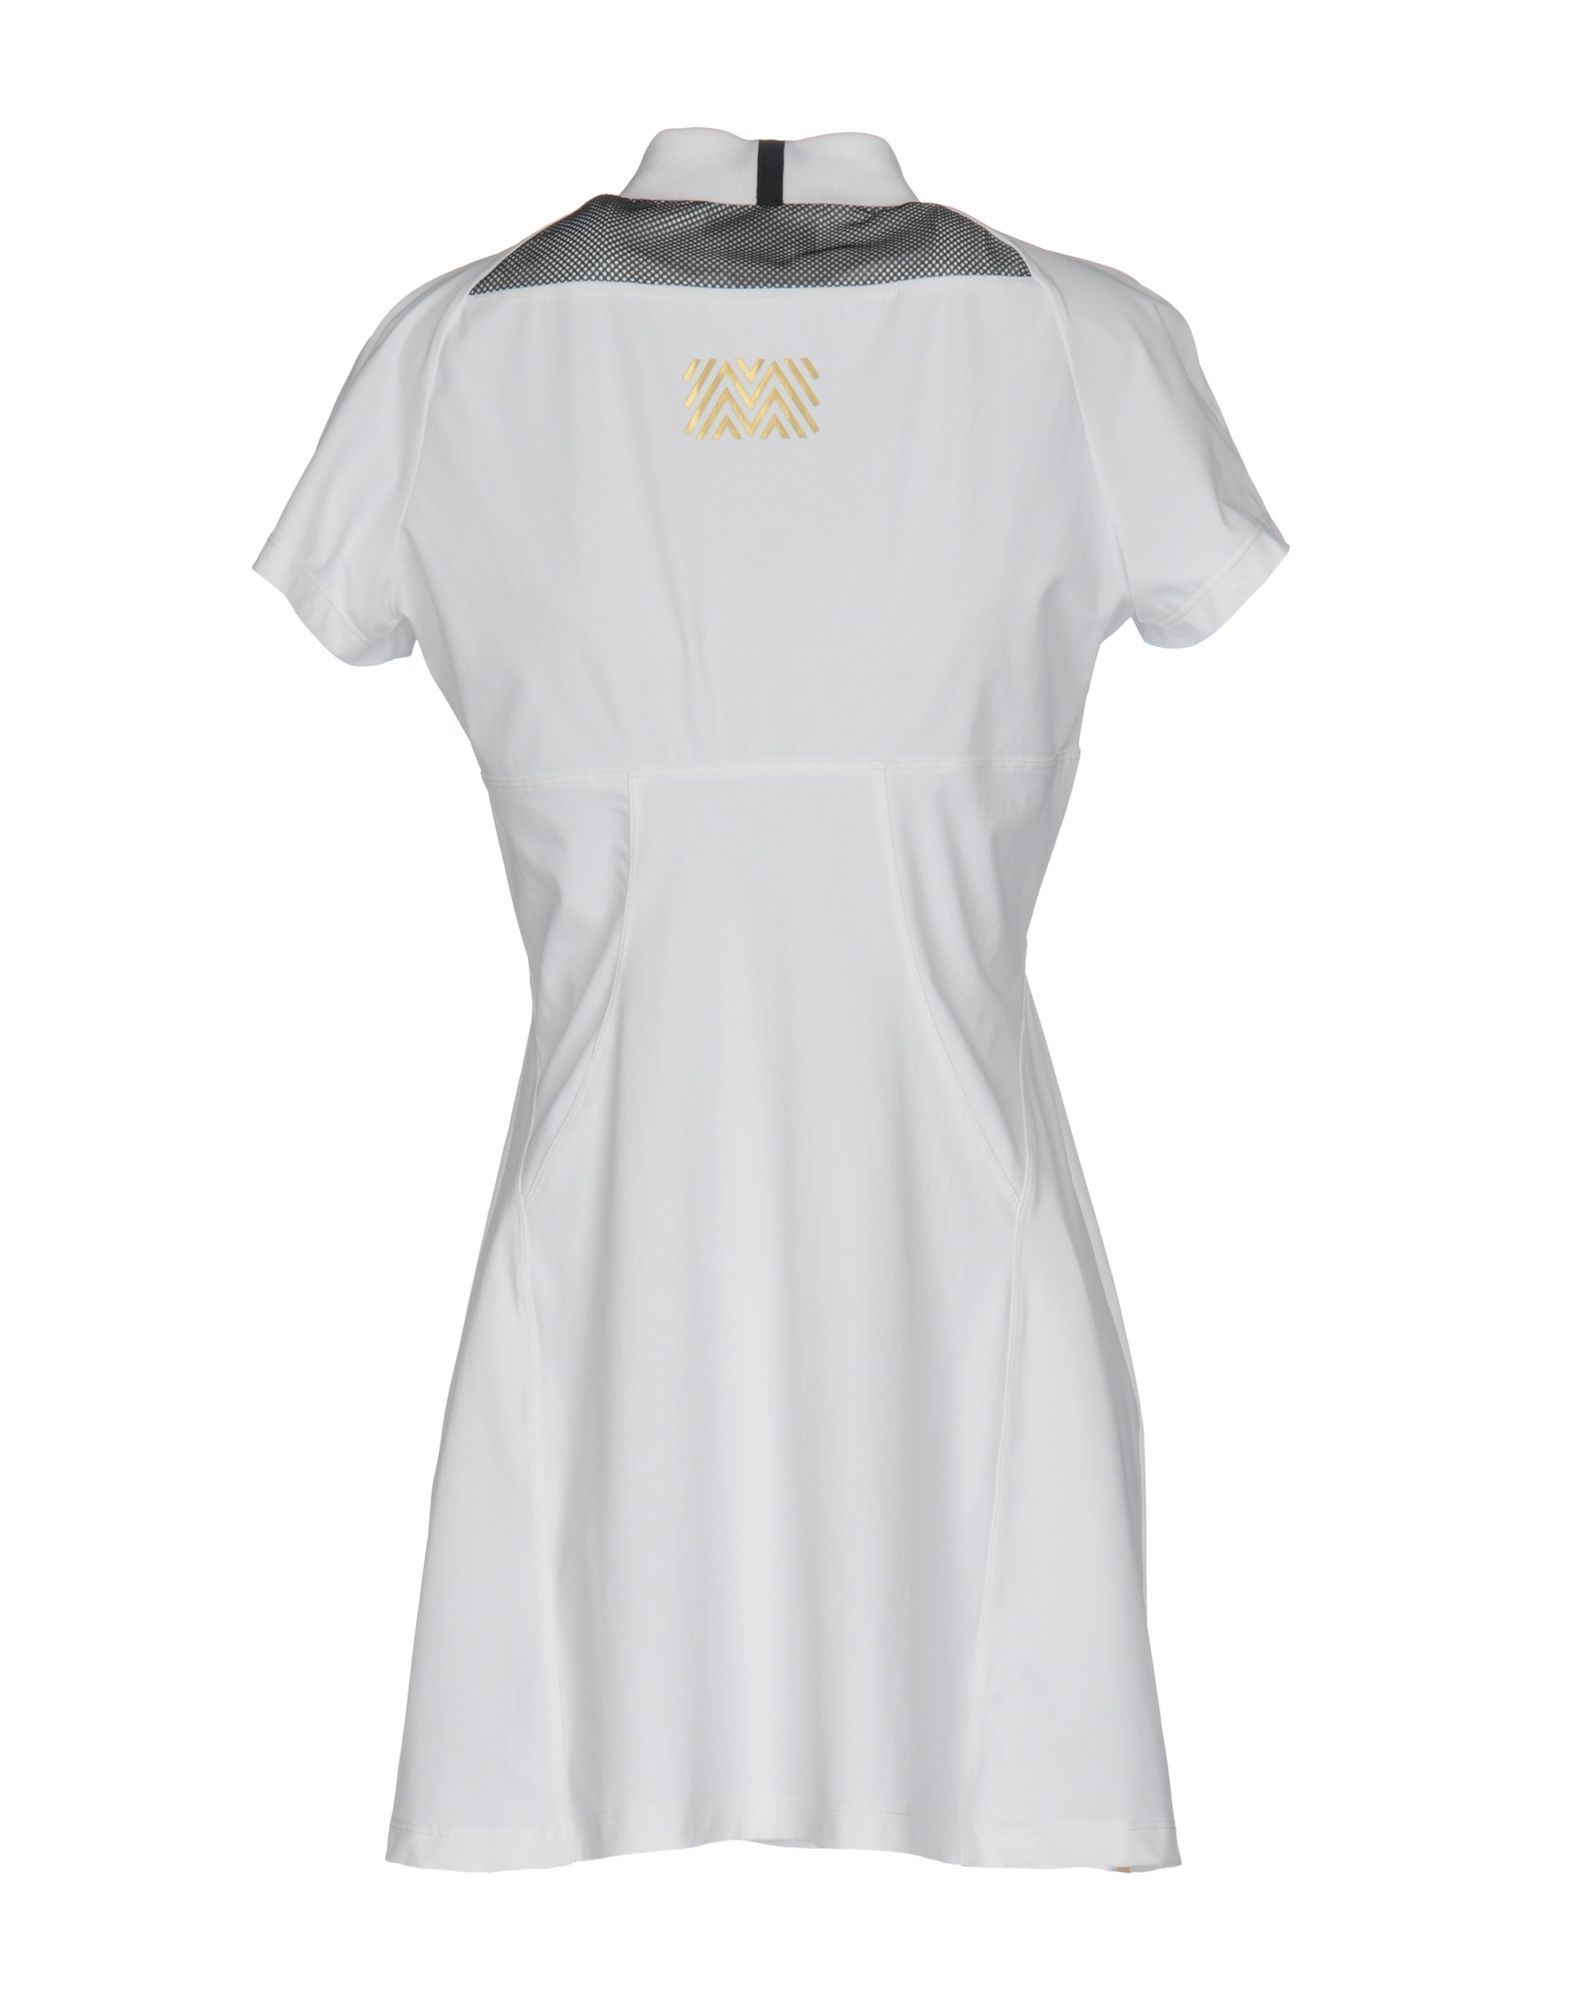 Monreal London White Techno Fabric Short Sleeve Tennis Dress